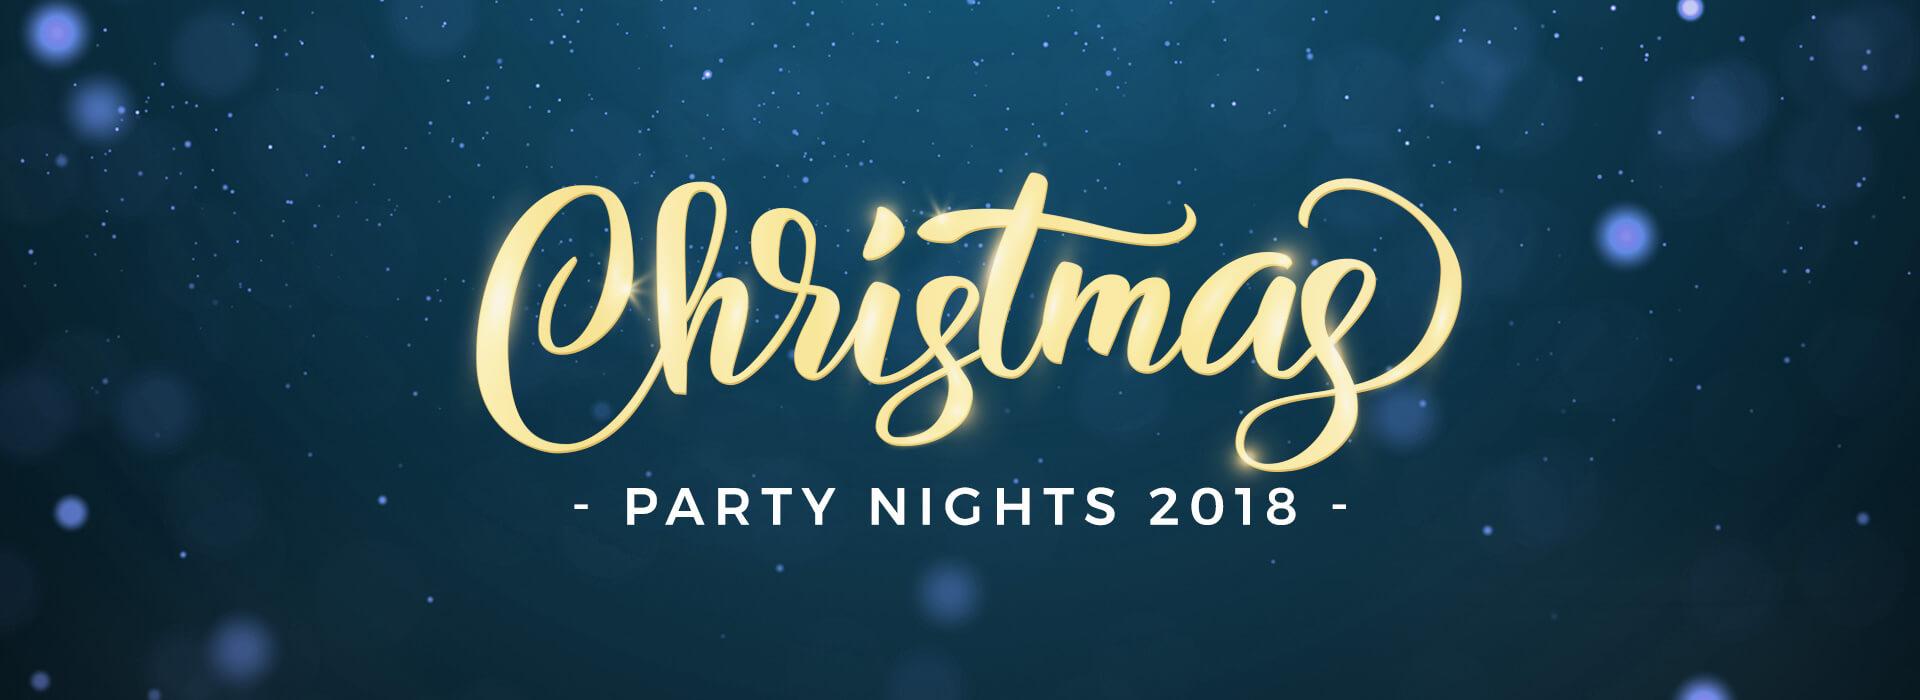 John Smith\'s Stadium | Christmas Party Nights At The Stadium